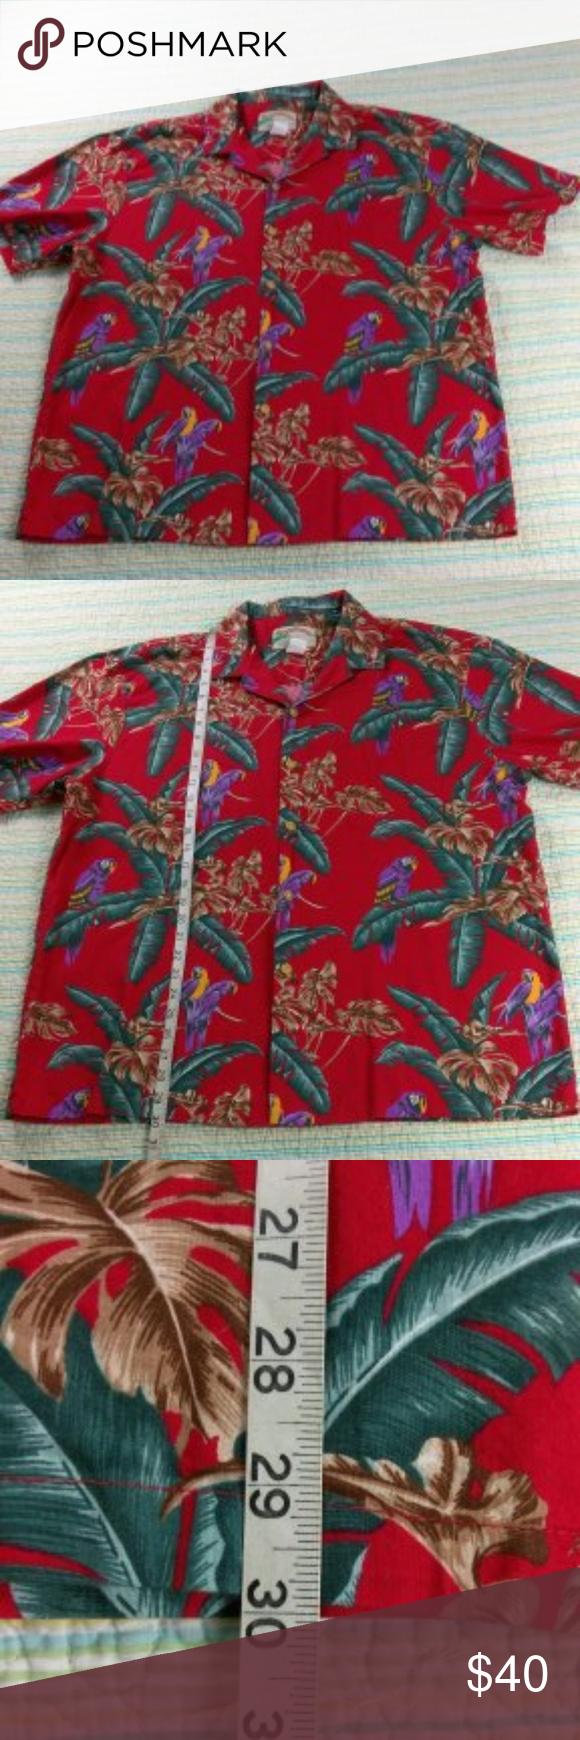 30b33410 Paradise Found XL Magnum PI Jungle Parrot Shirt Paradise Found XL Magnum PI  Jungle Bird Parrot Hawaiian Red Camp Shirt Aloha USA Paradise Found Shirts  ...